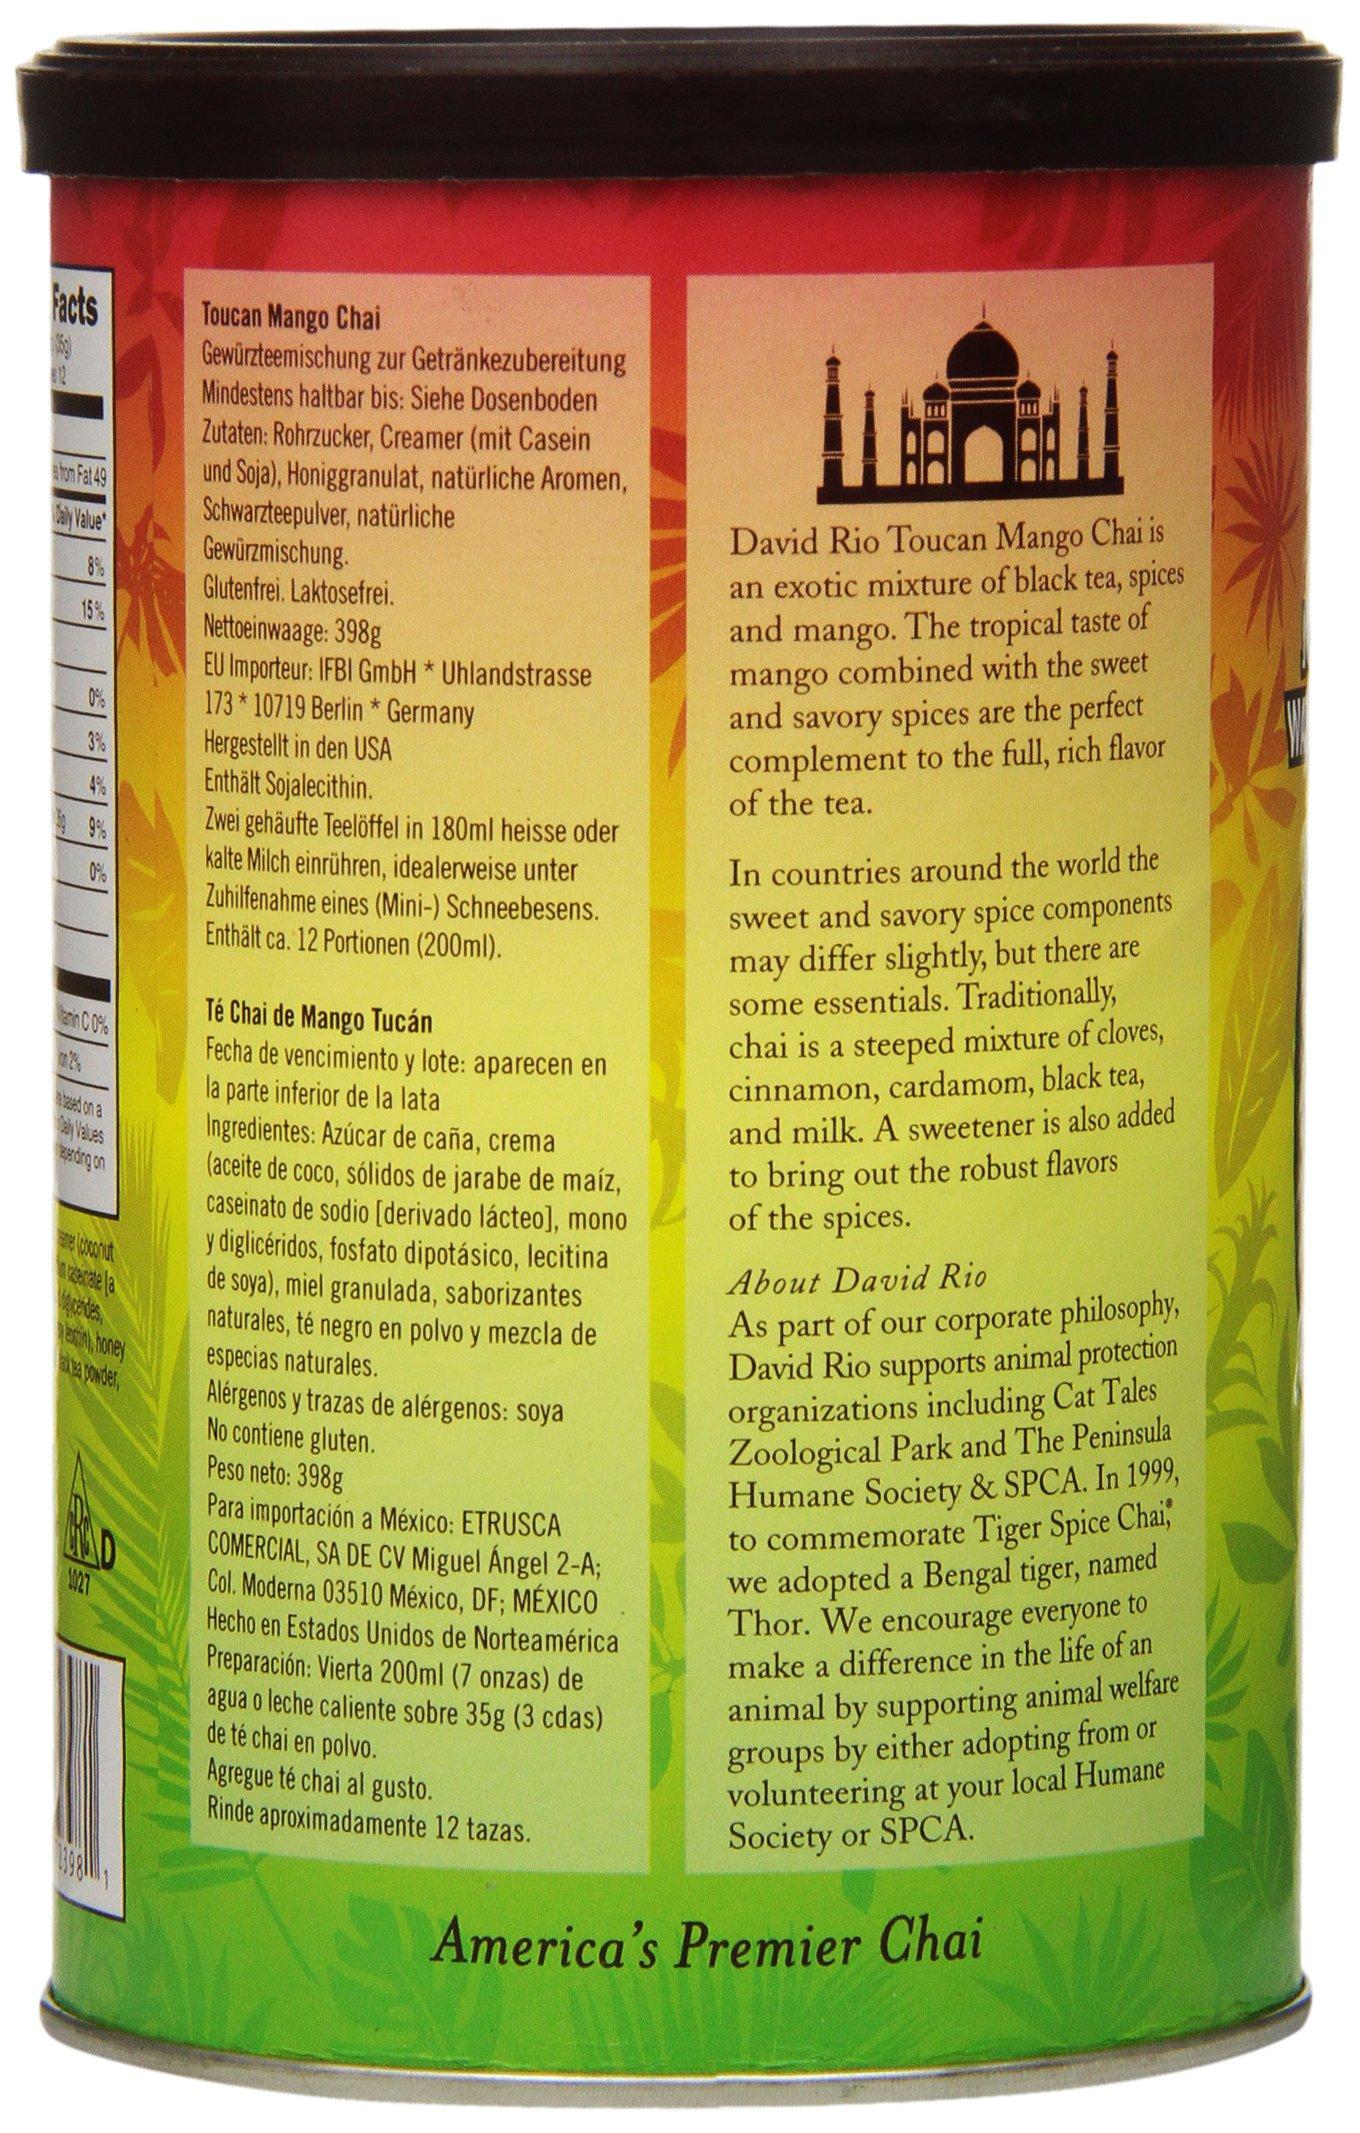 CHAI-DRio-Toucan-Mango-Pulver-von-Sweet-Pharma